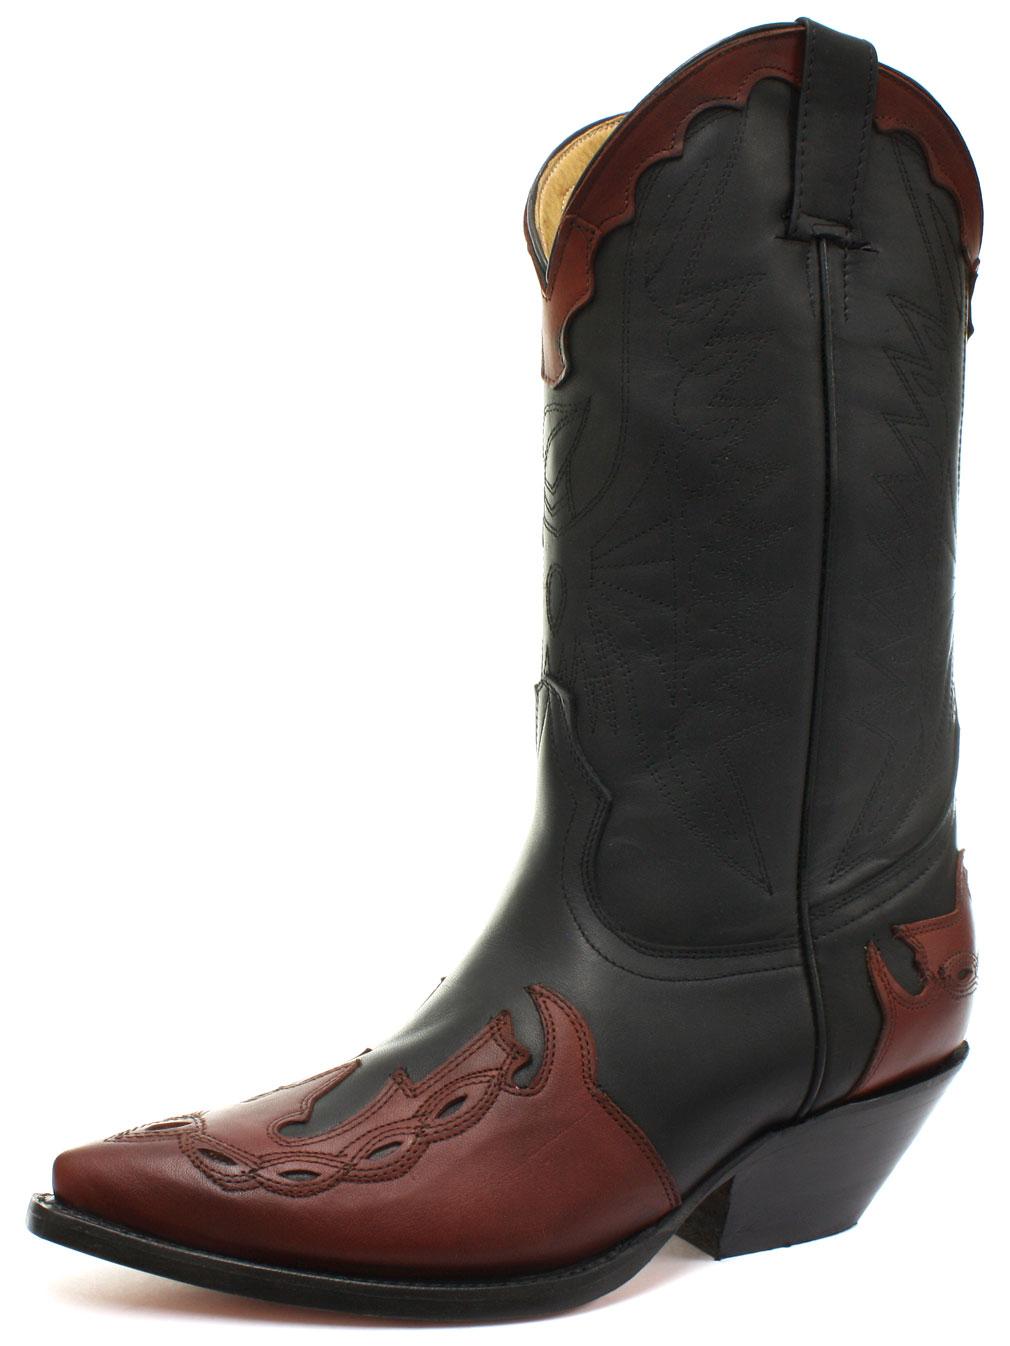 new grinders arizona black burgundy mens cowboy boots all